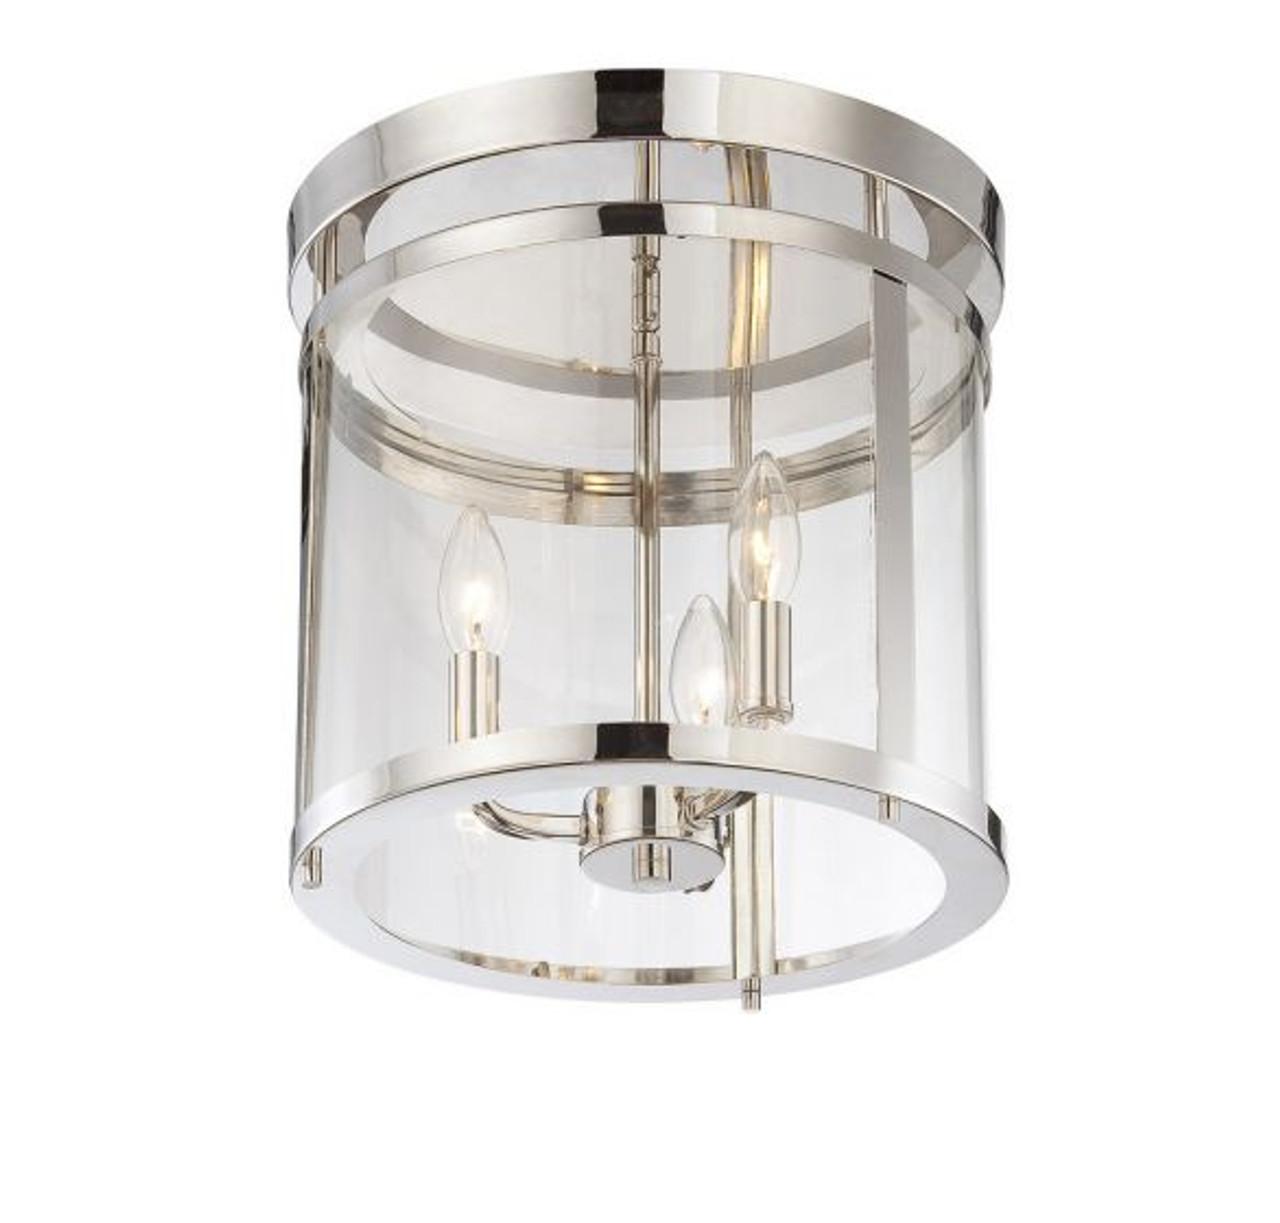 "Savoy House Penrose 13"", 3 Light, Polished Nickel, Semi-Flush Ceiling Light, Dimmable, 120V (6-1043-3-109)"